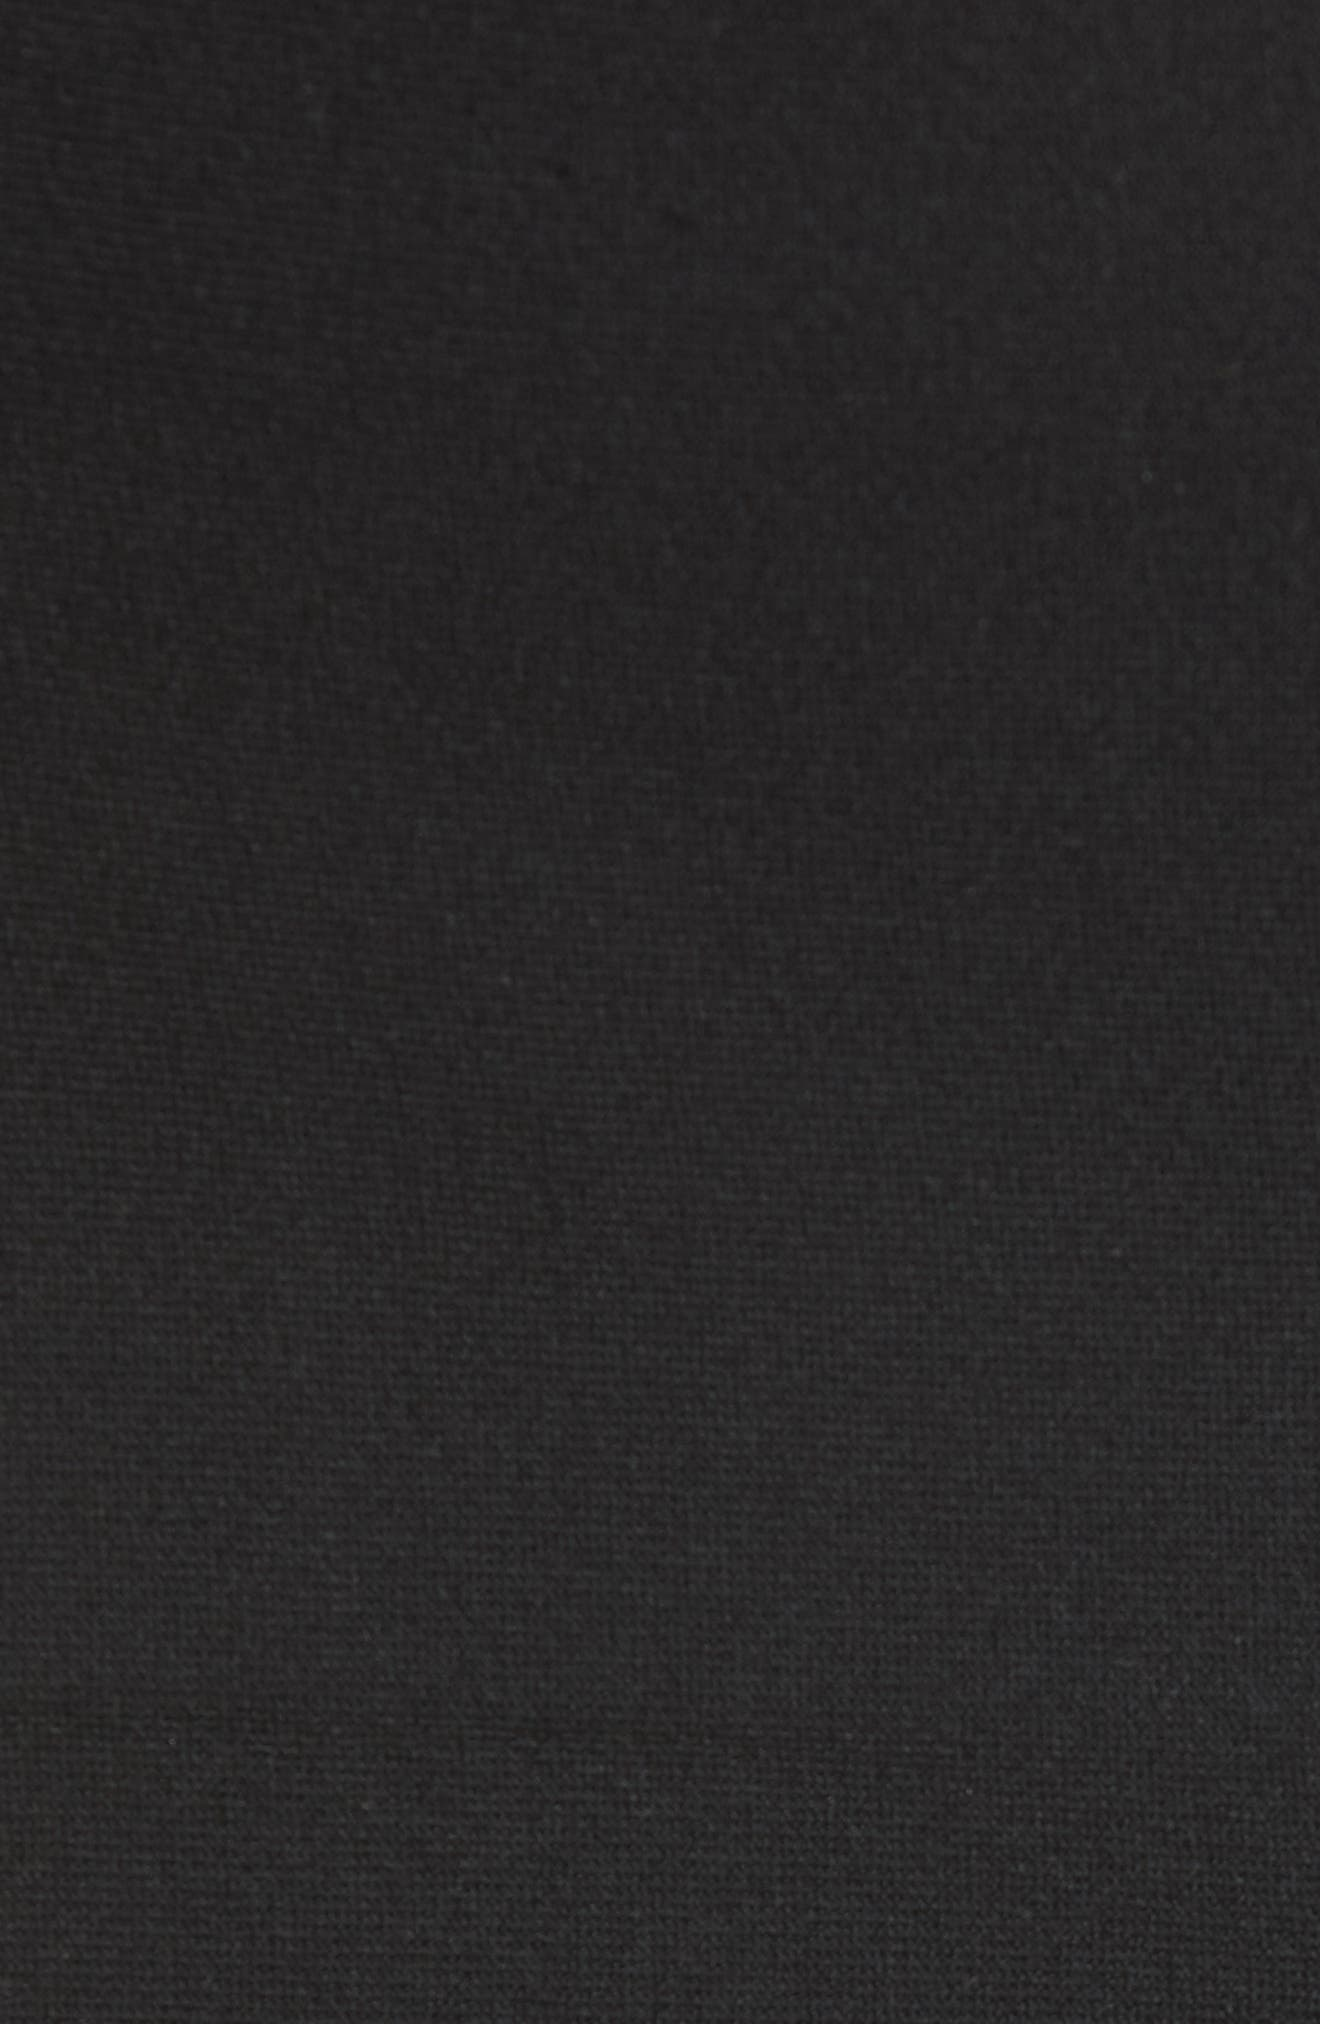 Layered Knit Off the Shoulder Dress,                             Alternate thumbnail 5, color,                             Black